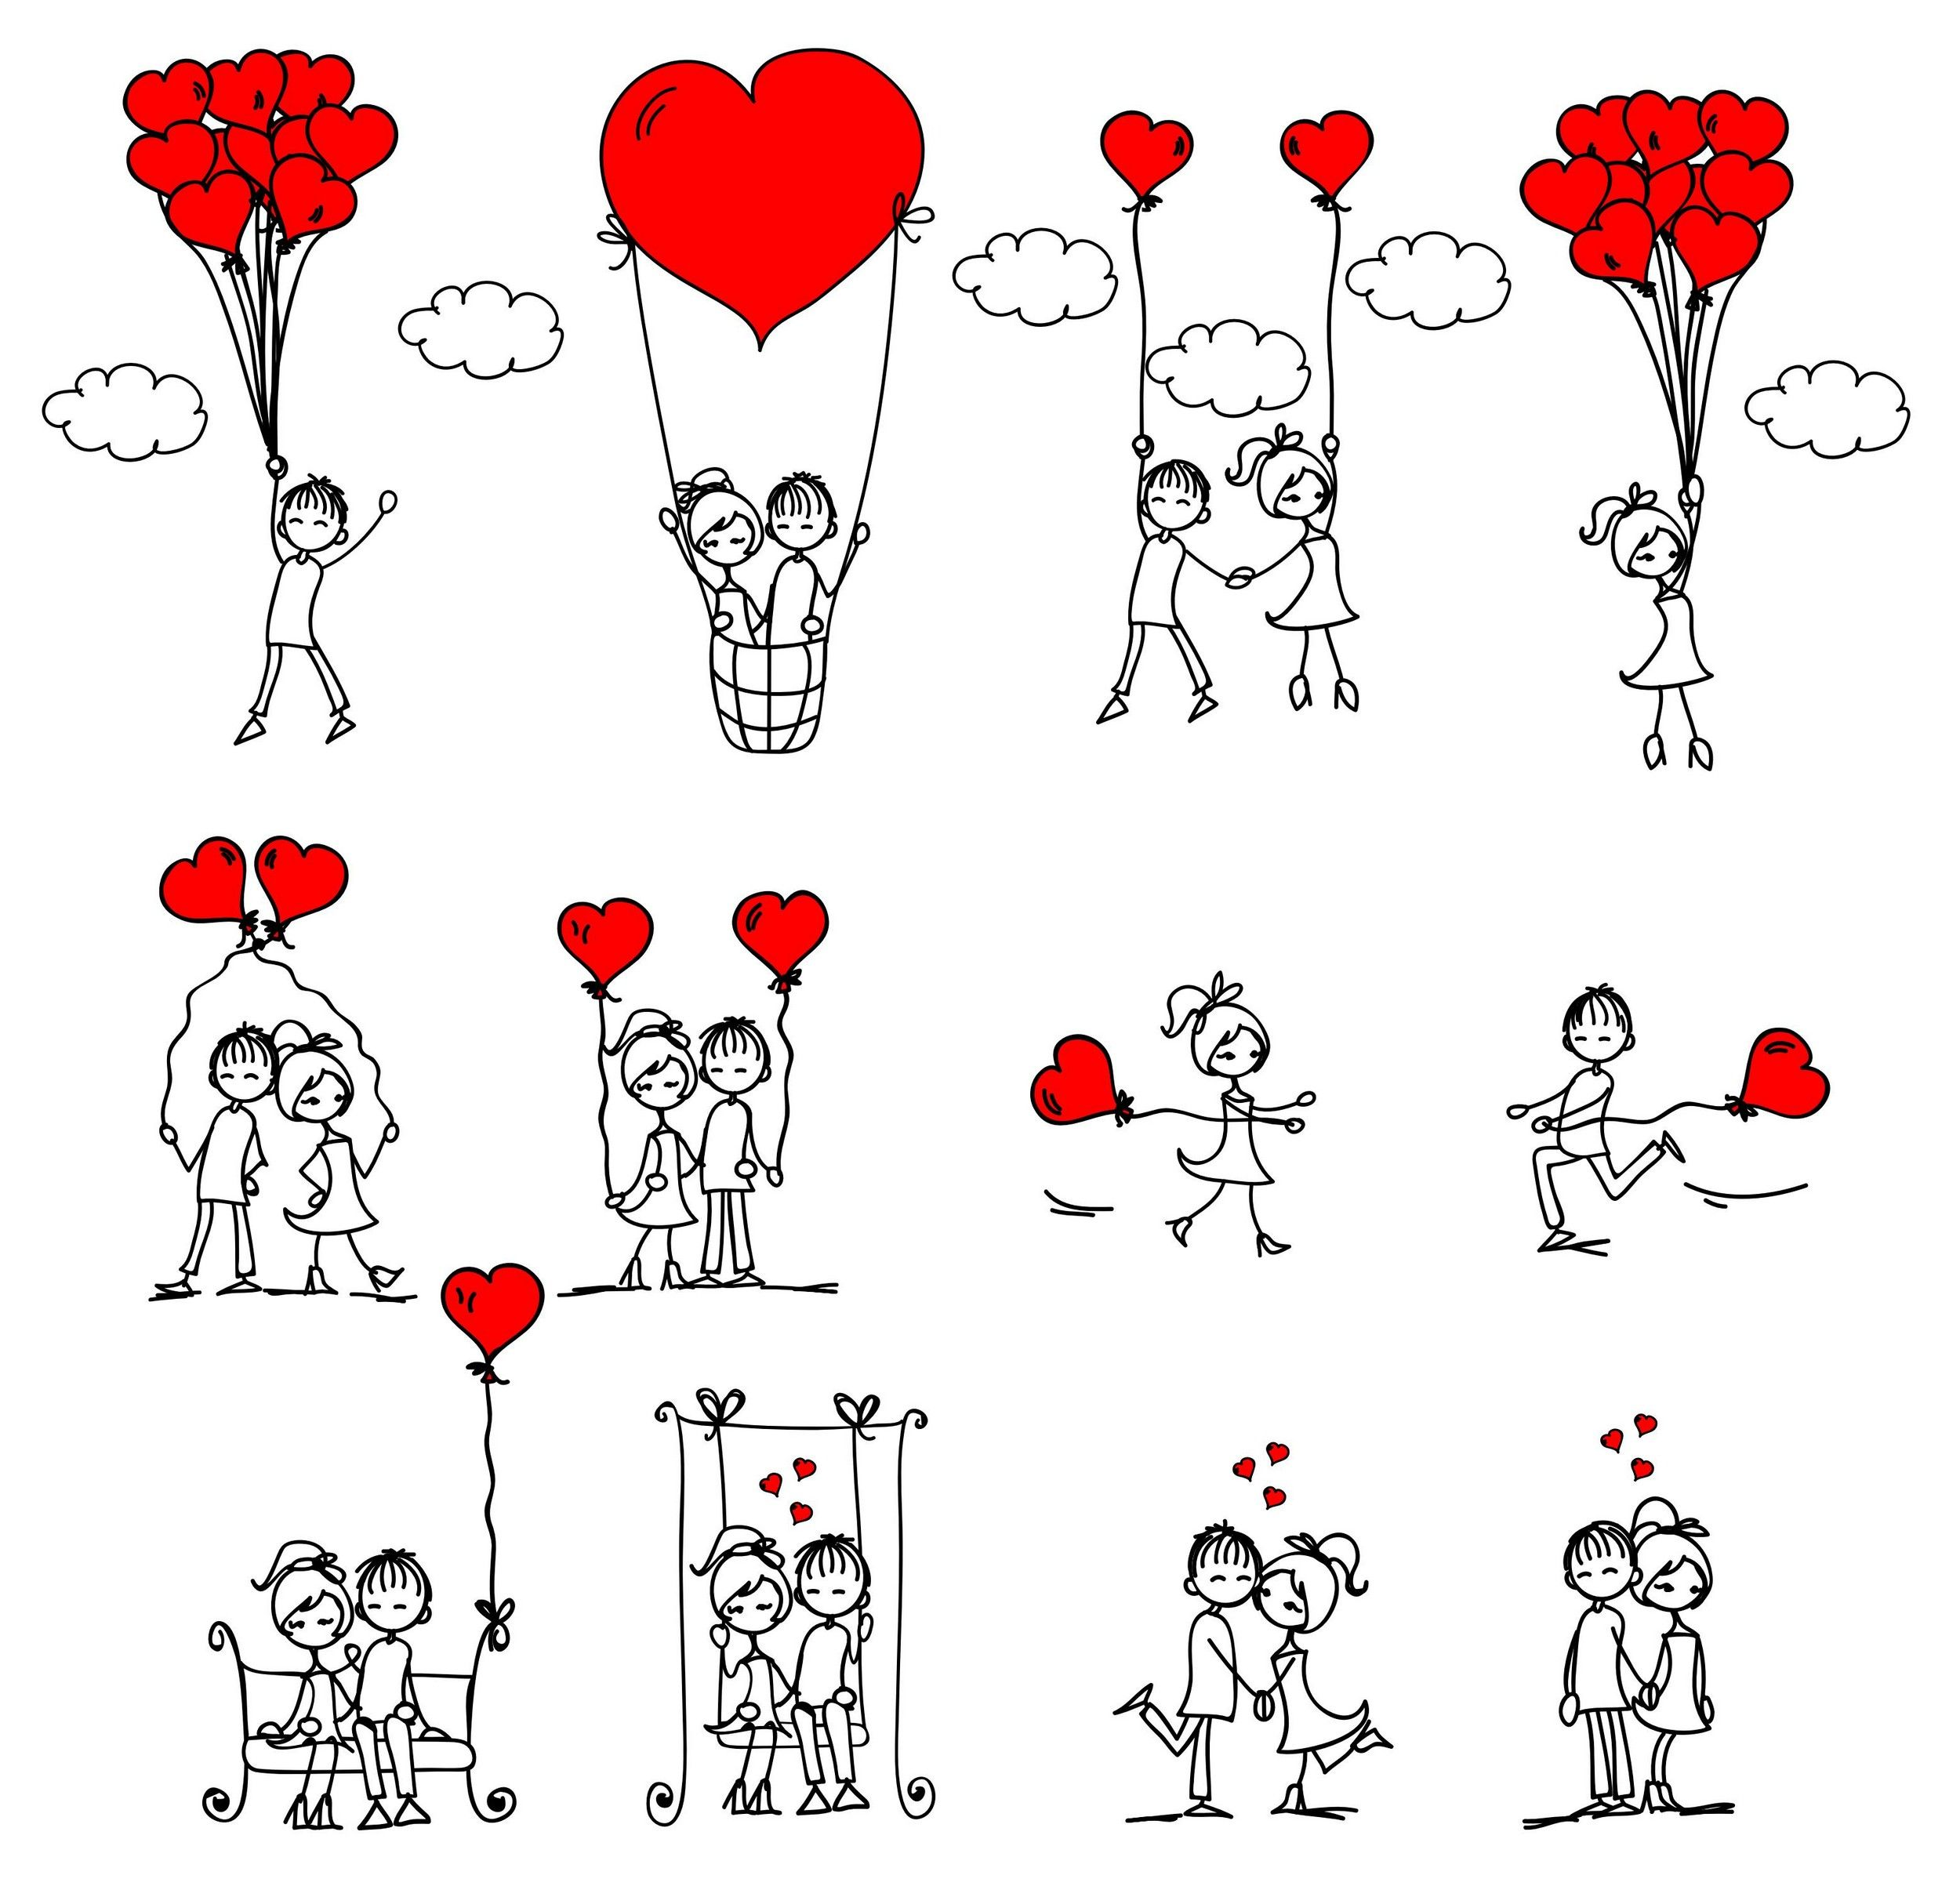 love illustration - Pesquisa Google | Ilustrações | Pinterest ...